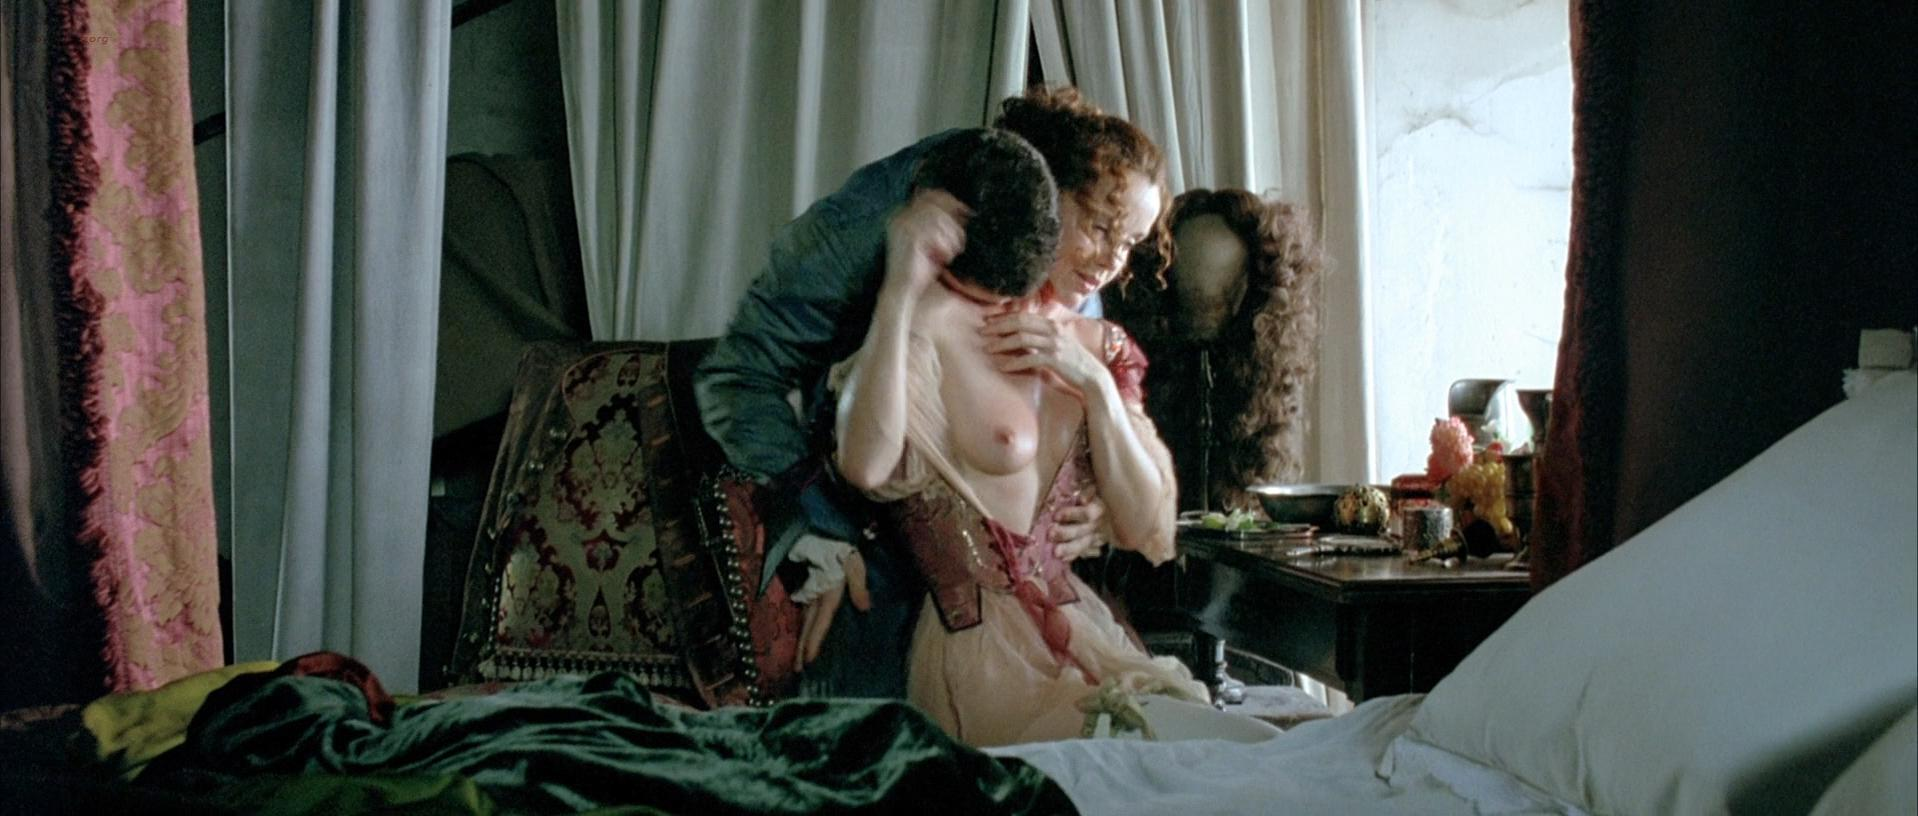 Uma Thurman nude, Philippine Leroy-Beaulieu nude, Marine Delterme nude - Vatel (2000)